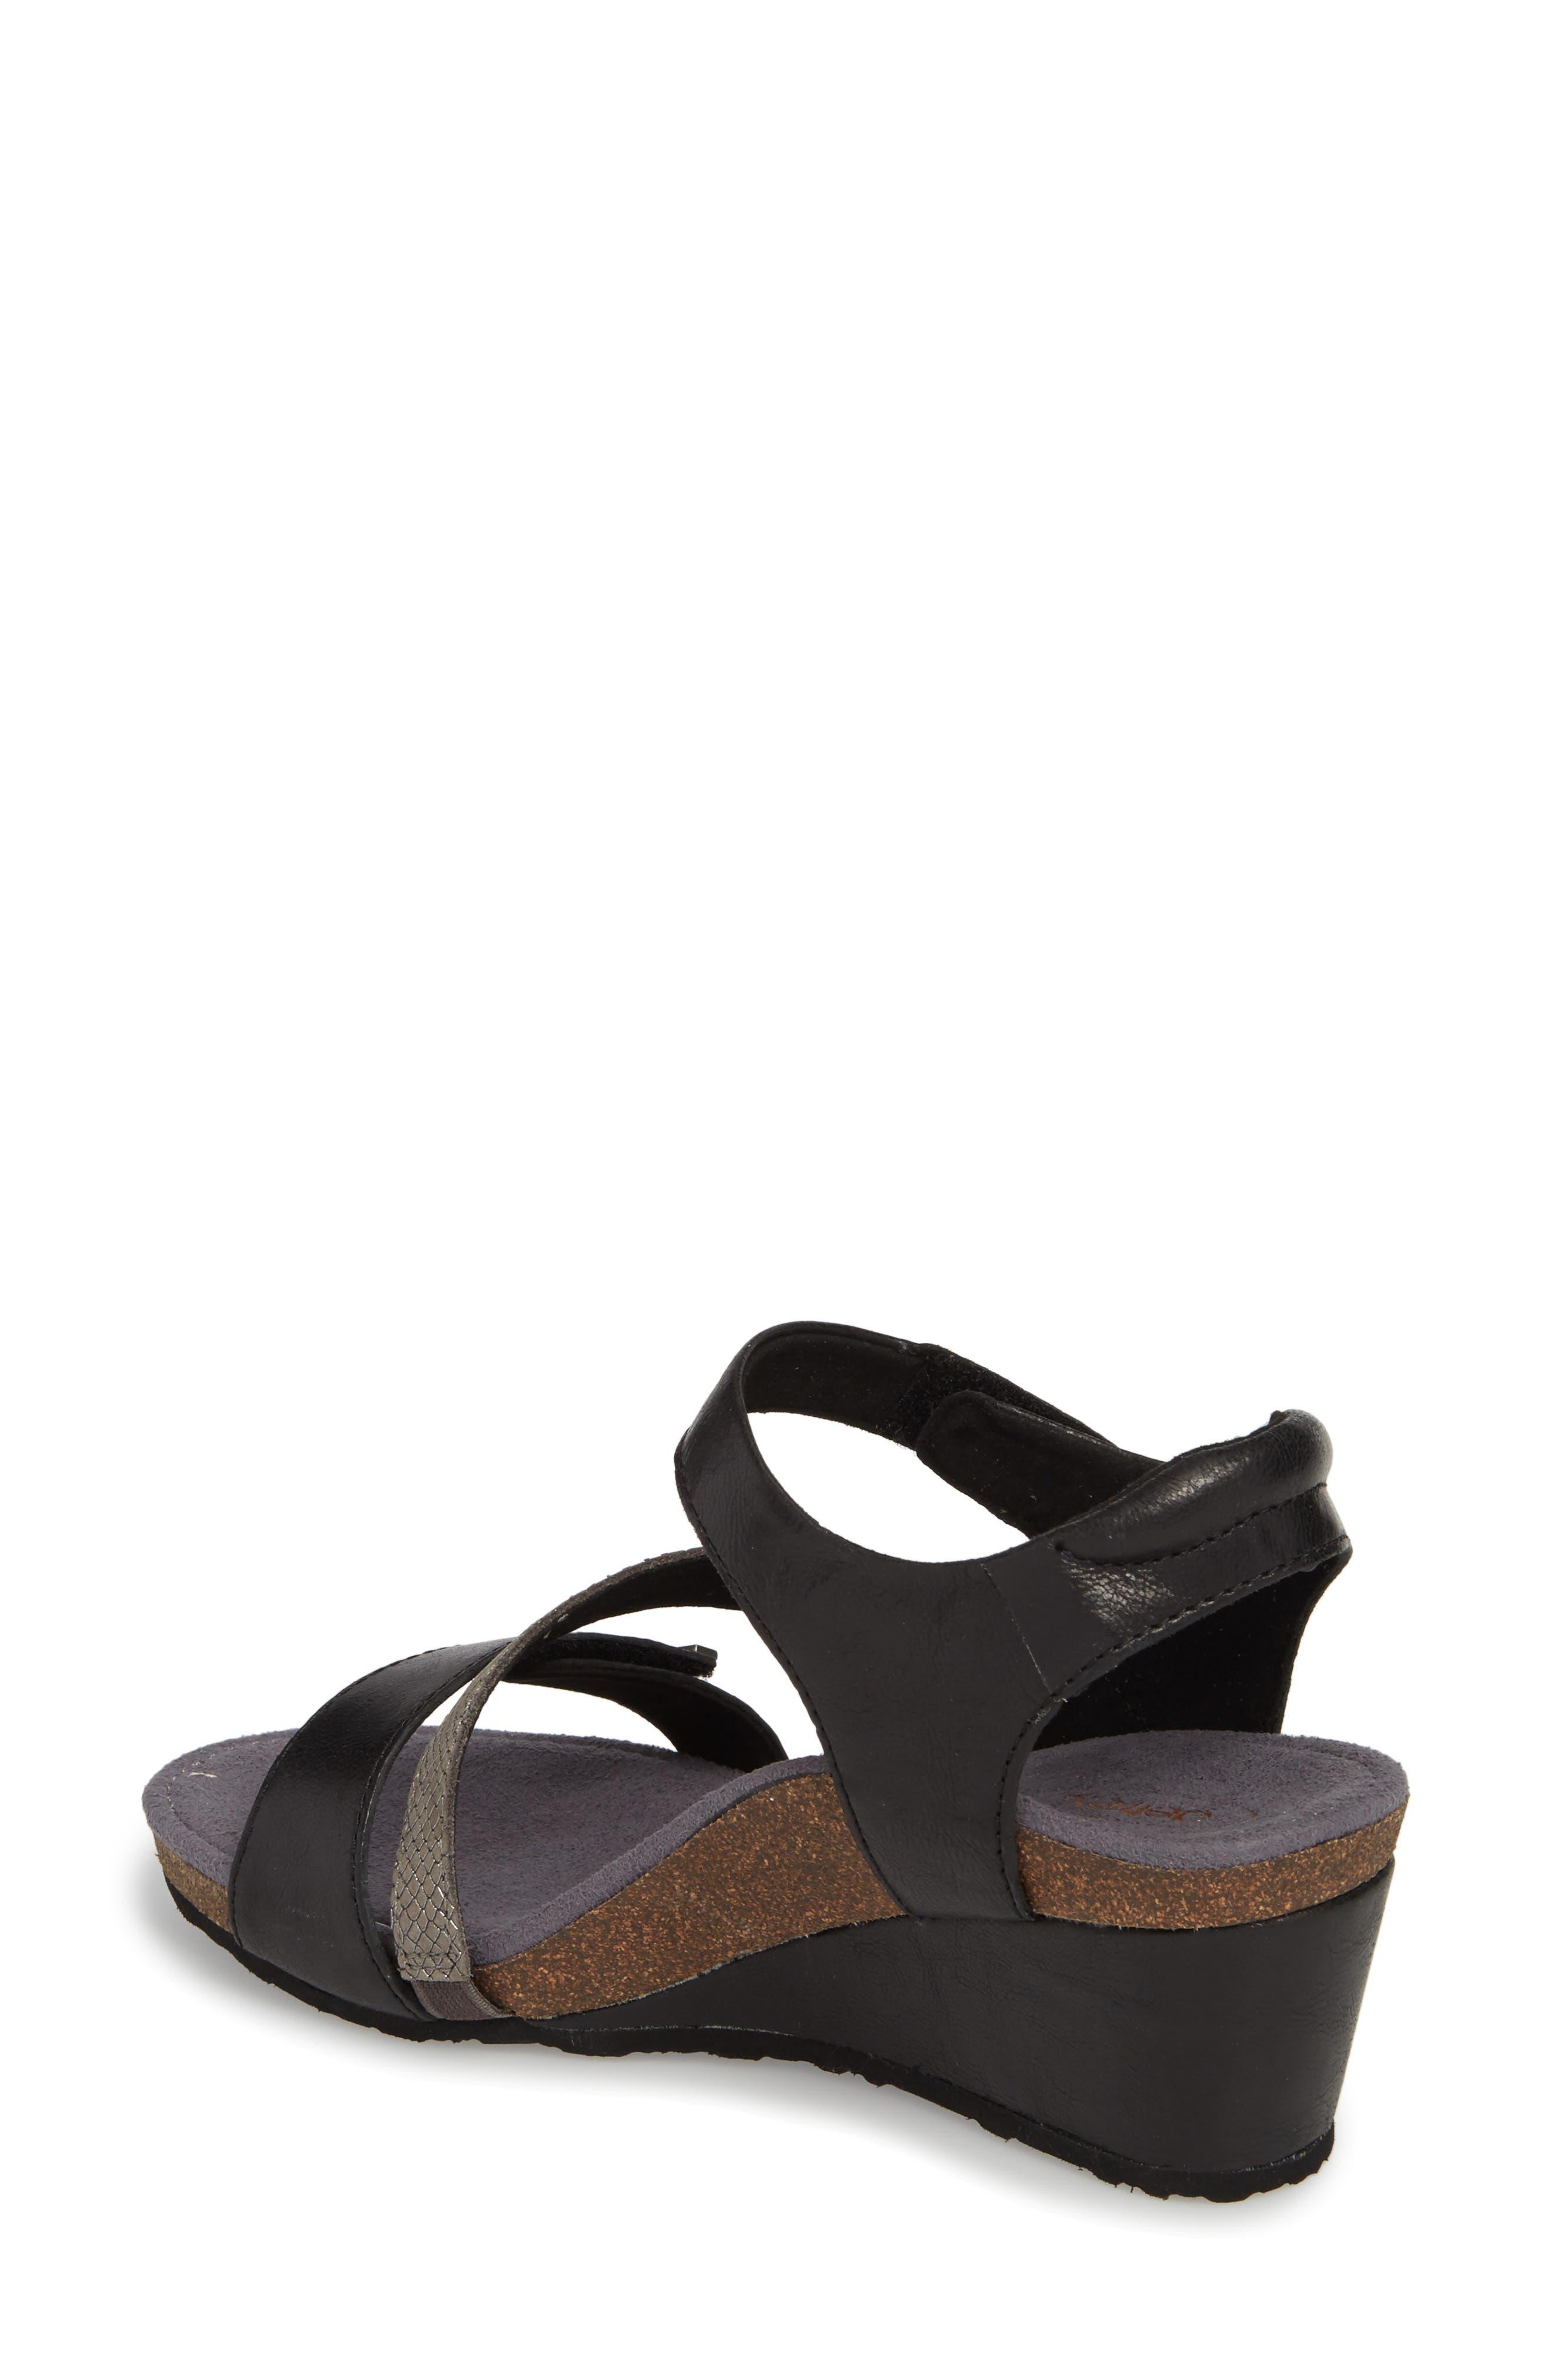 Brynn Asymmetrical Wedge Sandal,                             Alternate thumbnail 2, color,                             Black Leather